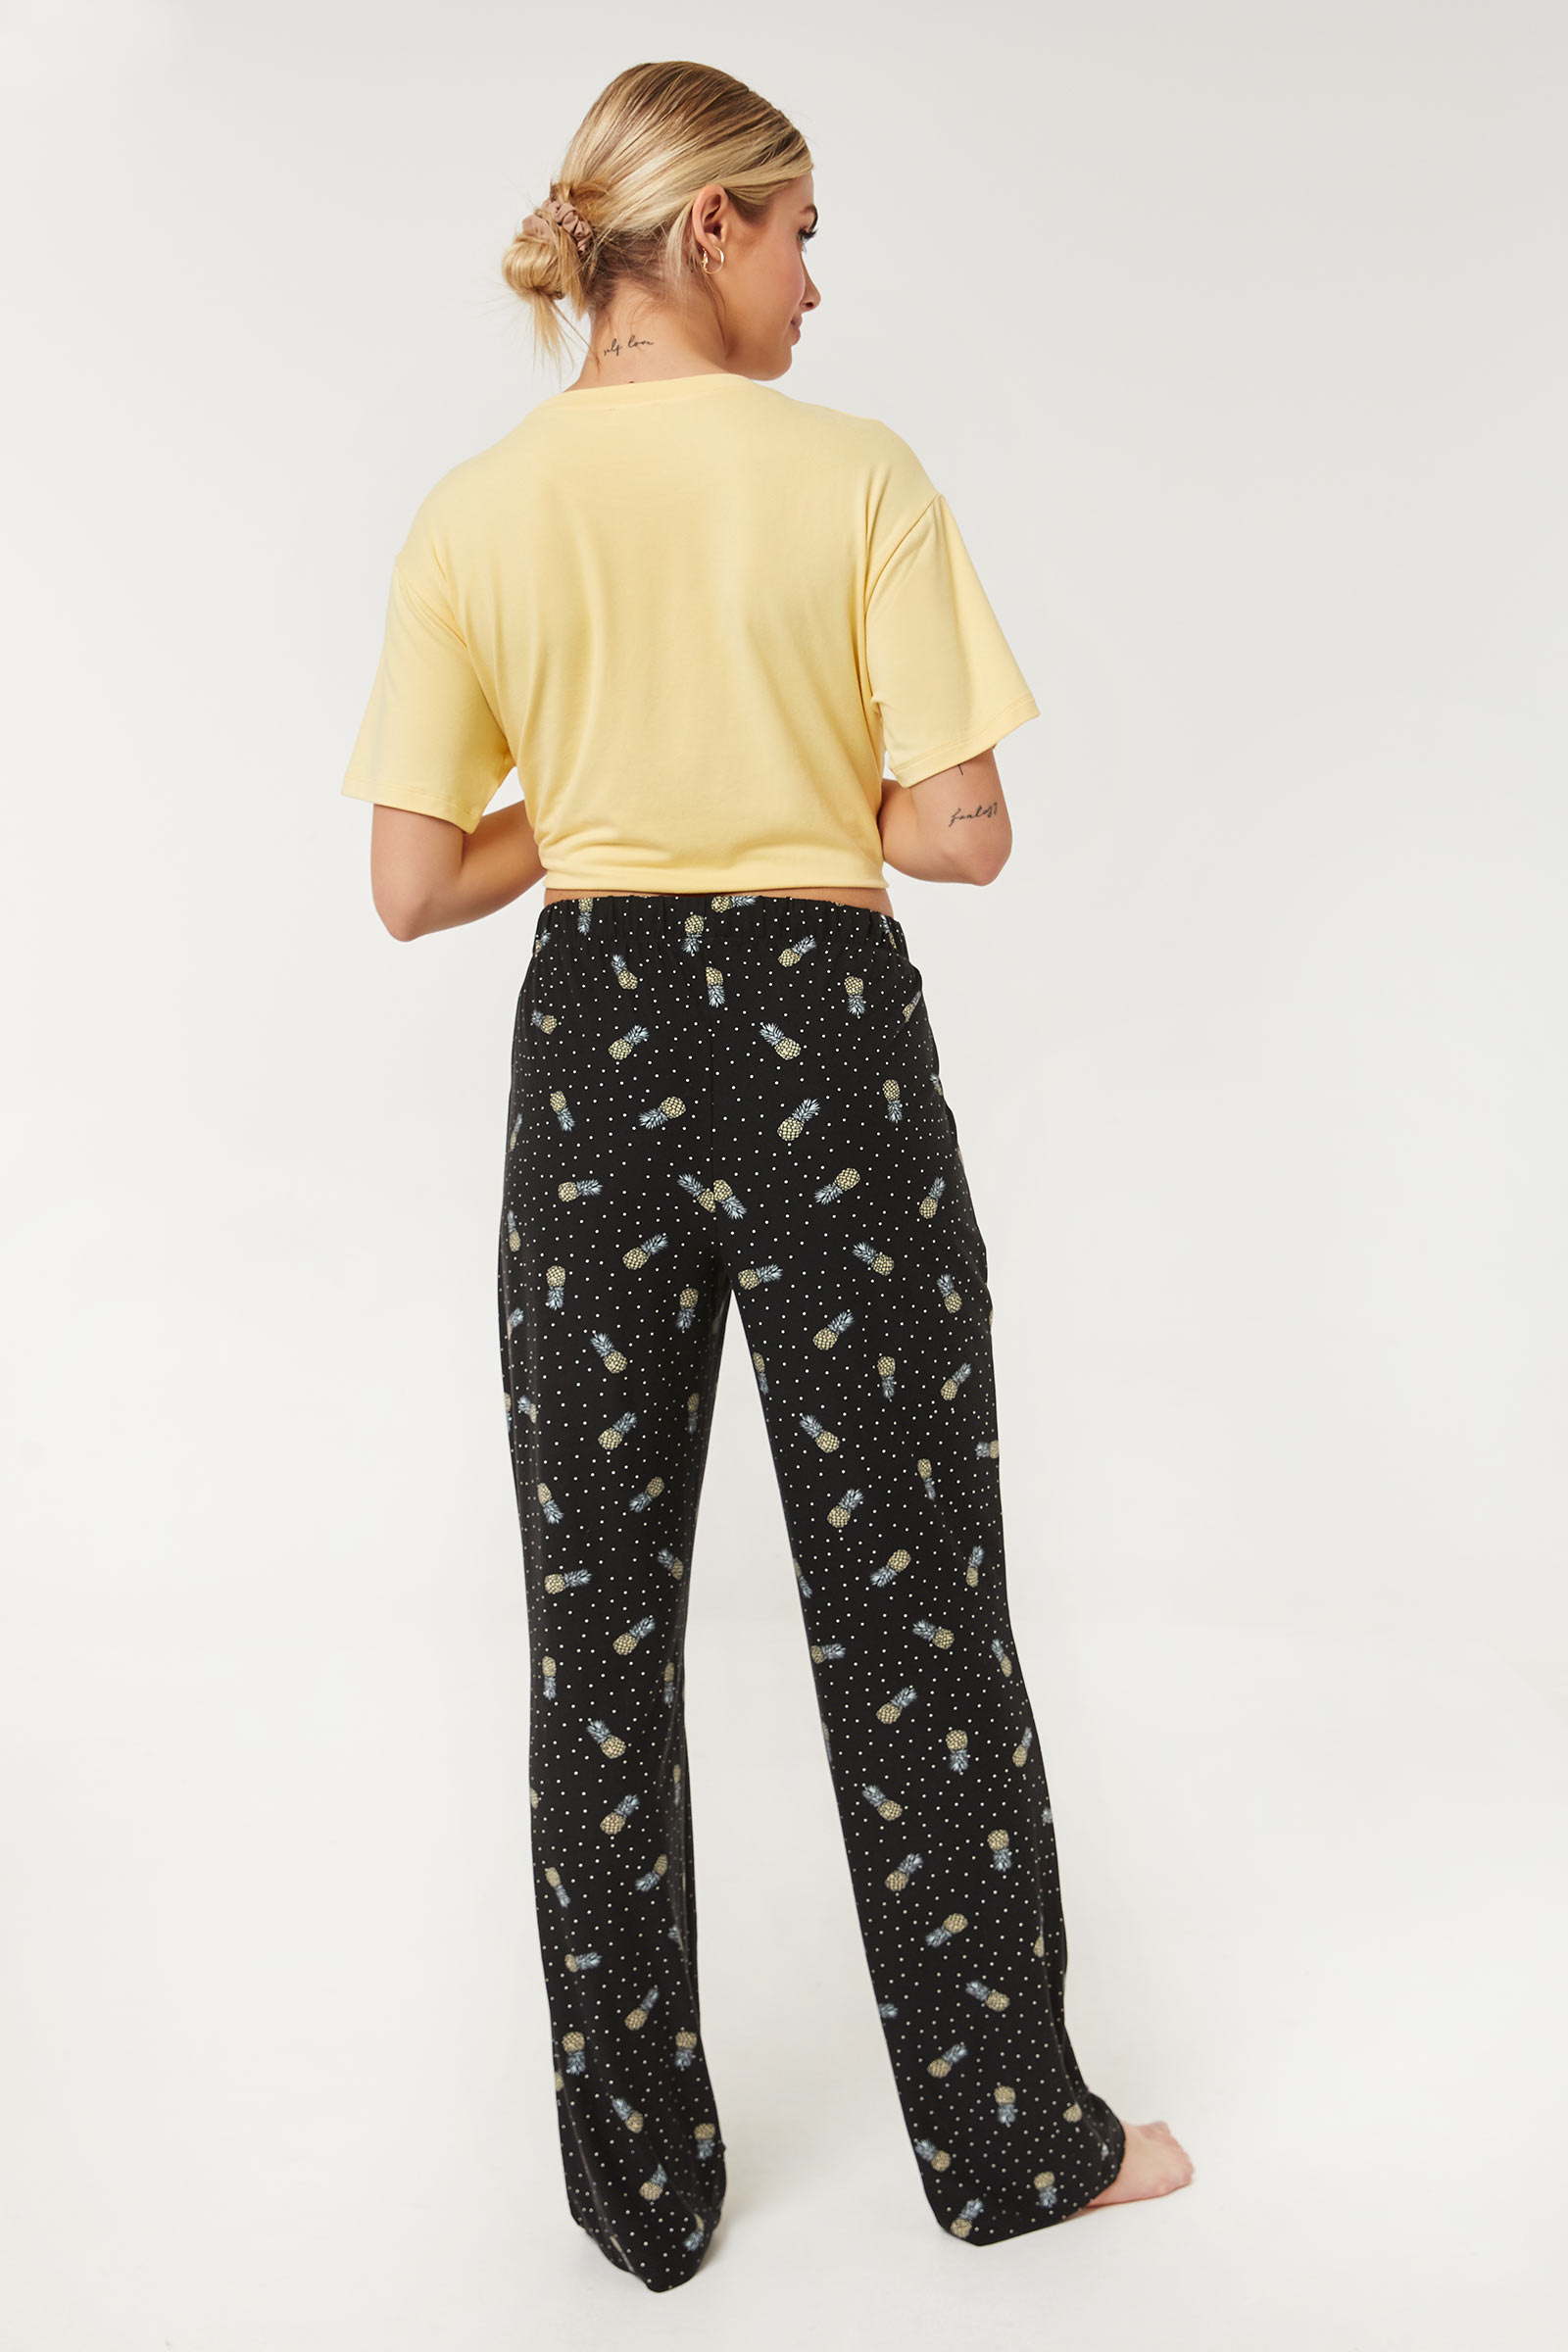 Pineapple PJ Pants